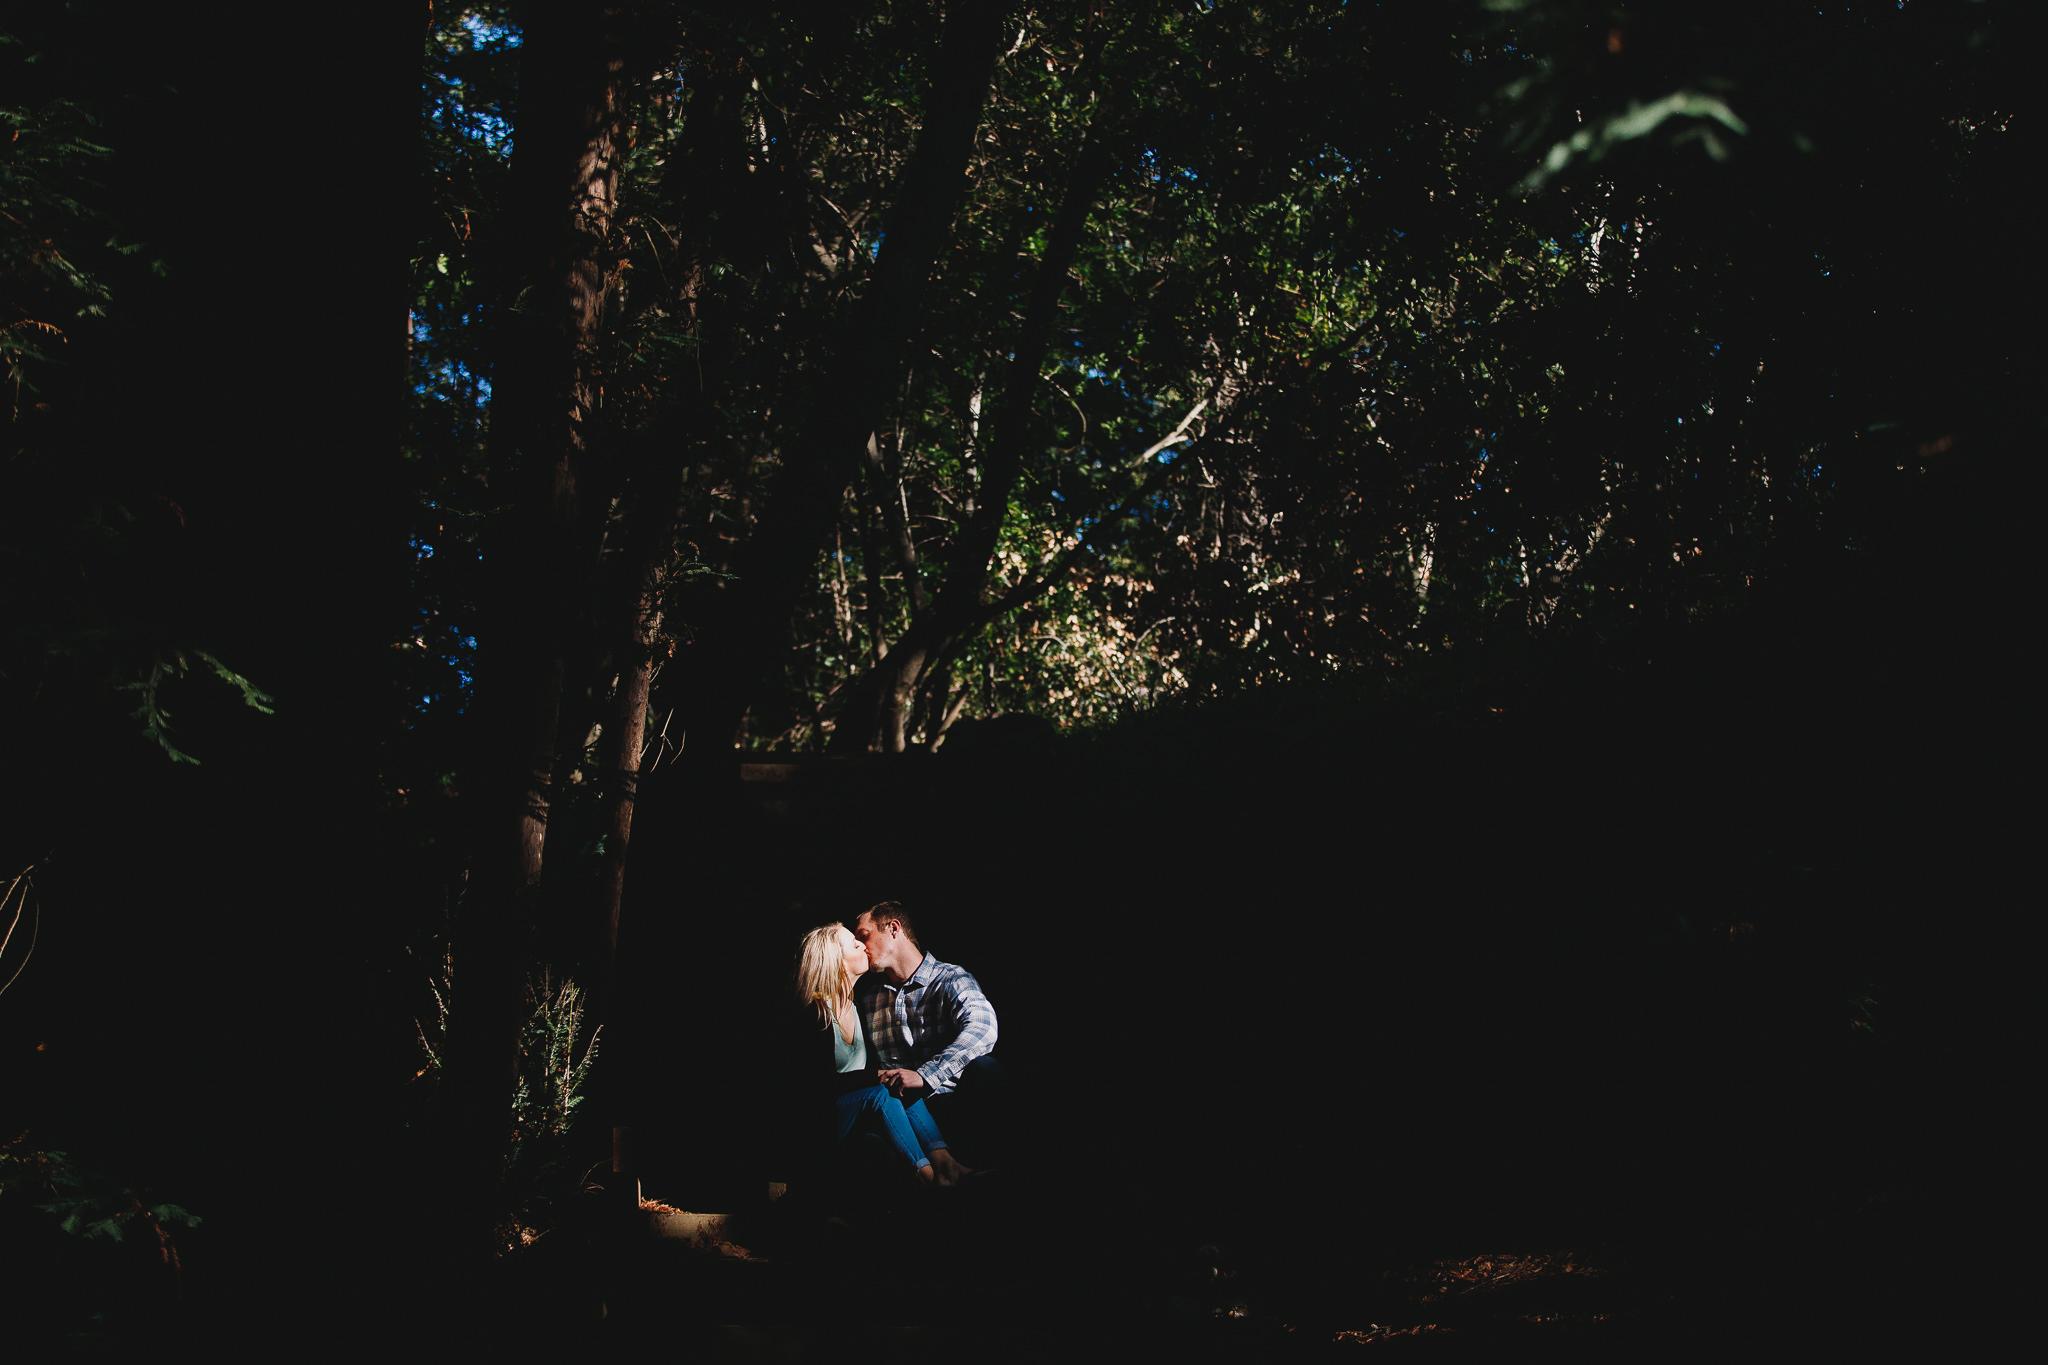 Archer Inspired Photography Michelle JJ Big Sur Wedding Engagement California Central Coast Lifestyle Documentary Photographer-67.jpg